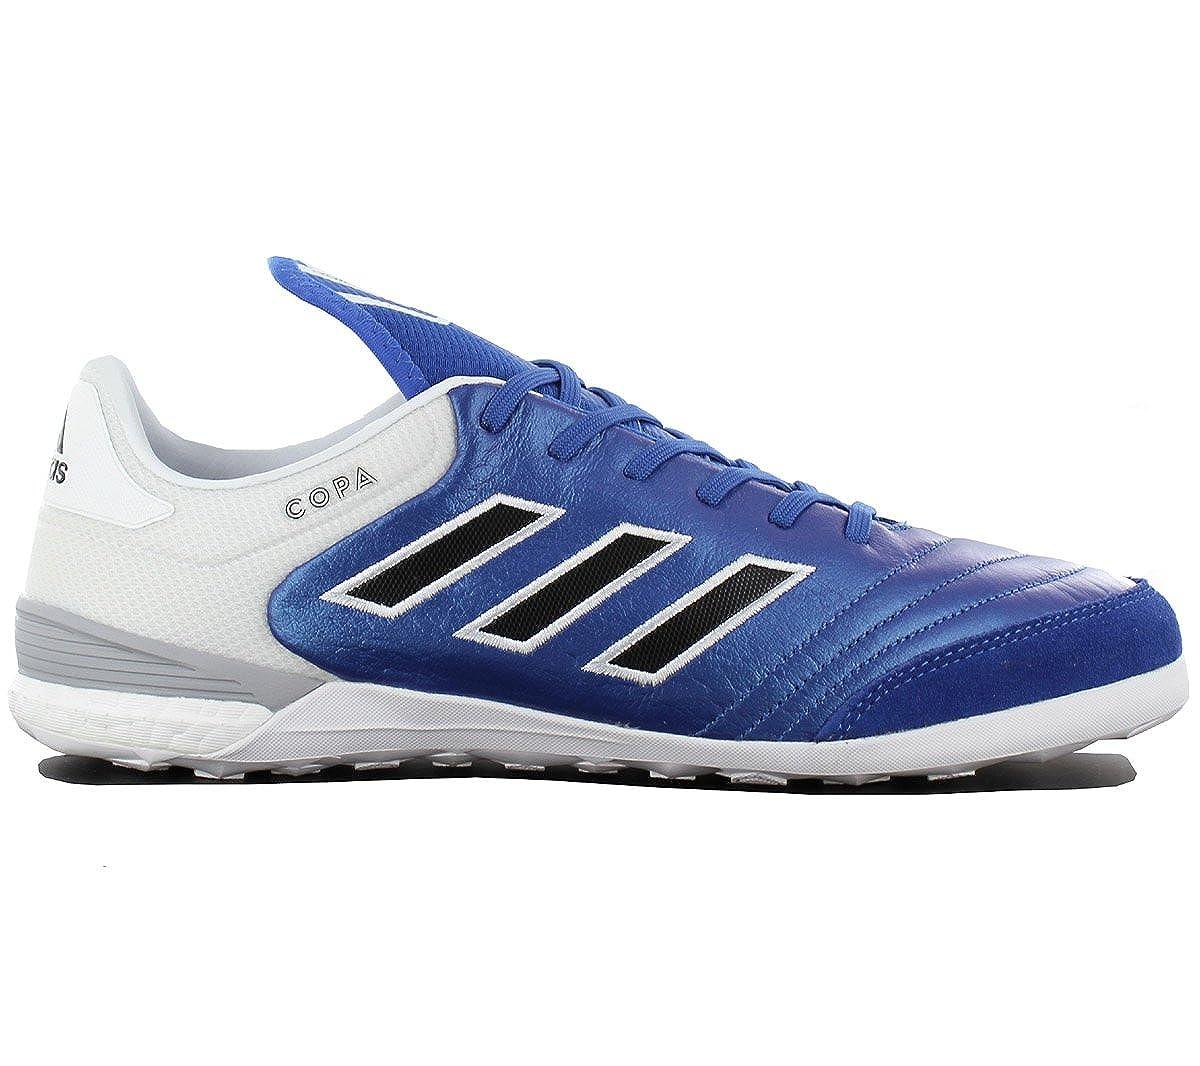 Adidas Herren Copa Tango 17.1 In für Fußballtrainingsschuhe, Blau (Blu Azul Negbas ftwbla), 42 EU